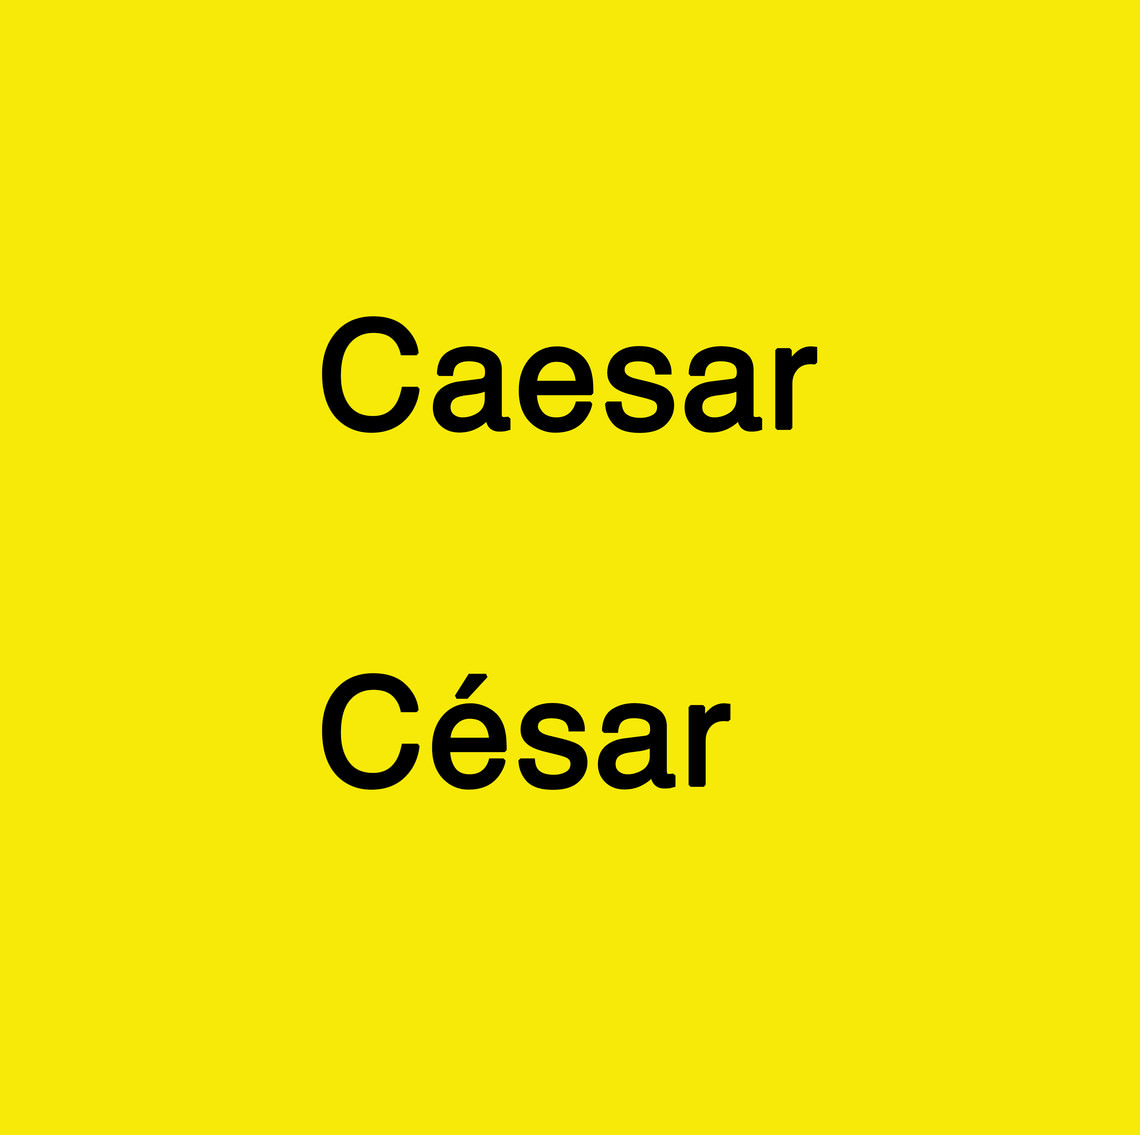 - Caesar César